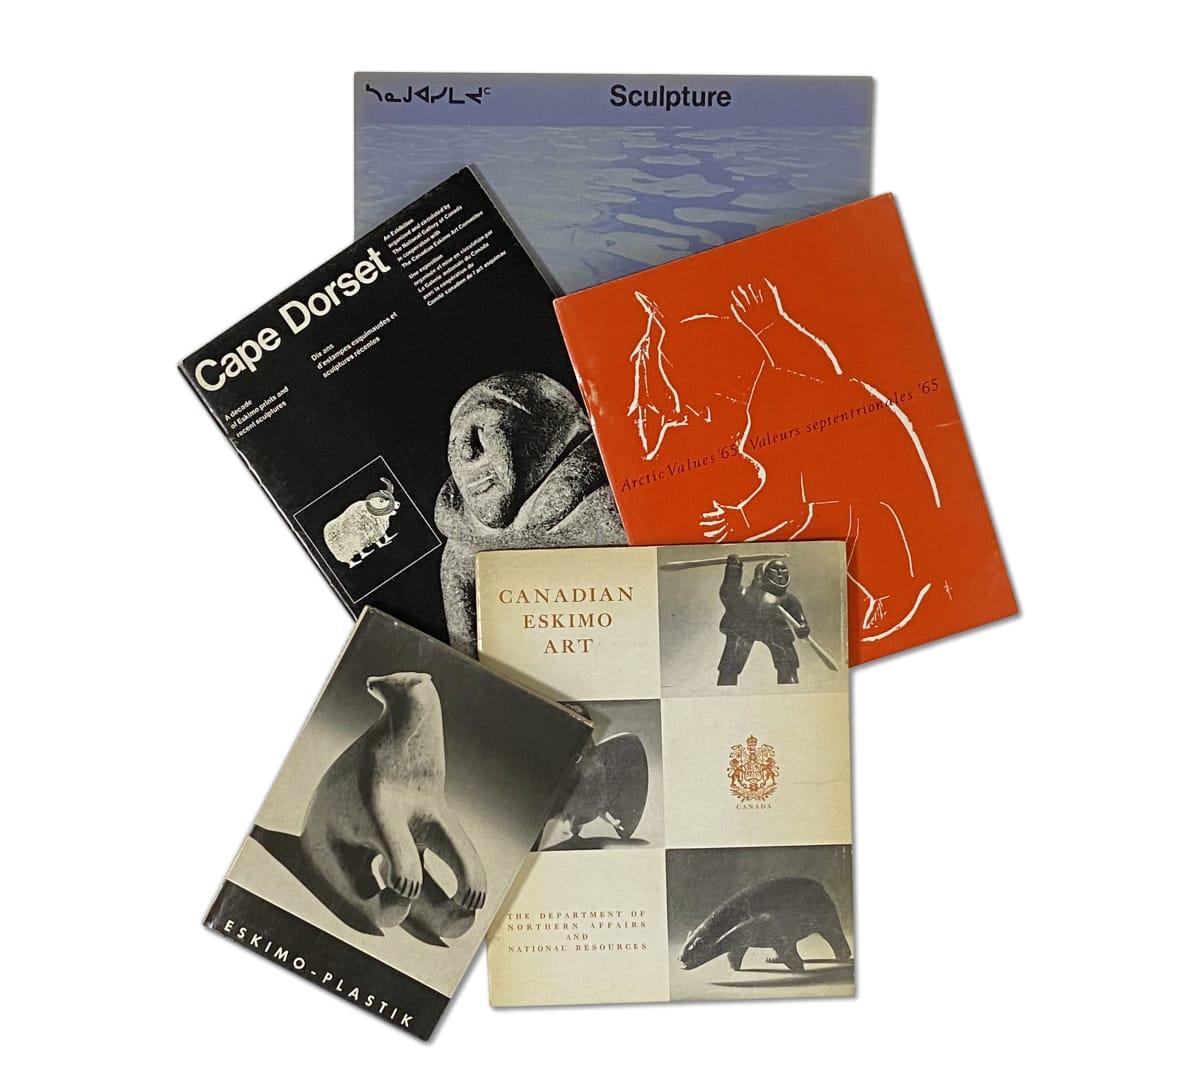 Lot 85 Quantity of Inuit Art Publications Estimate: $100 — $150